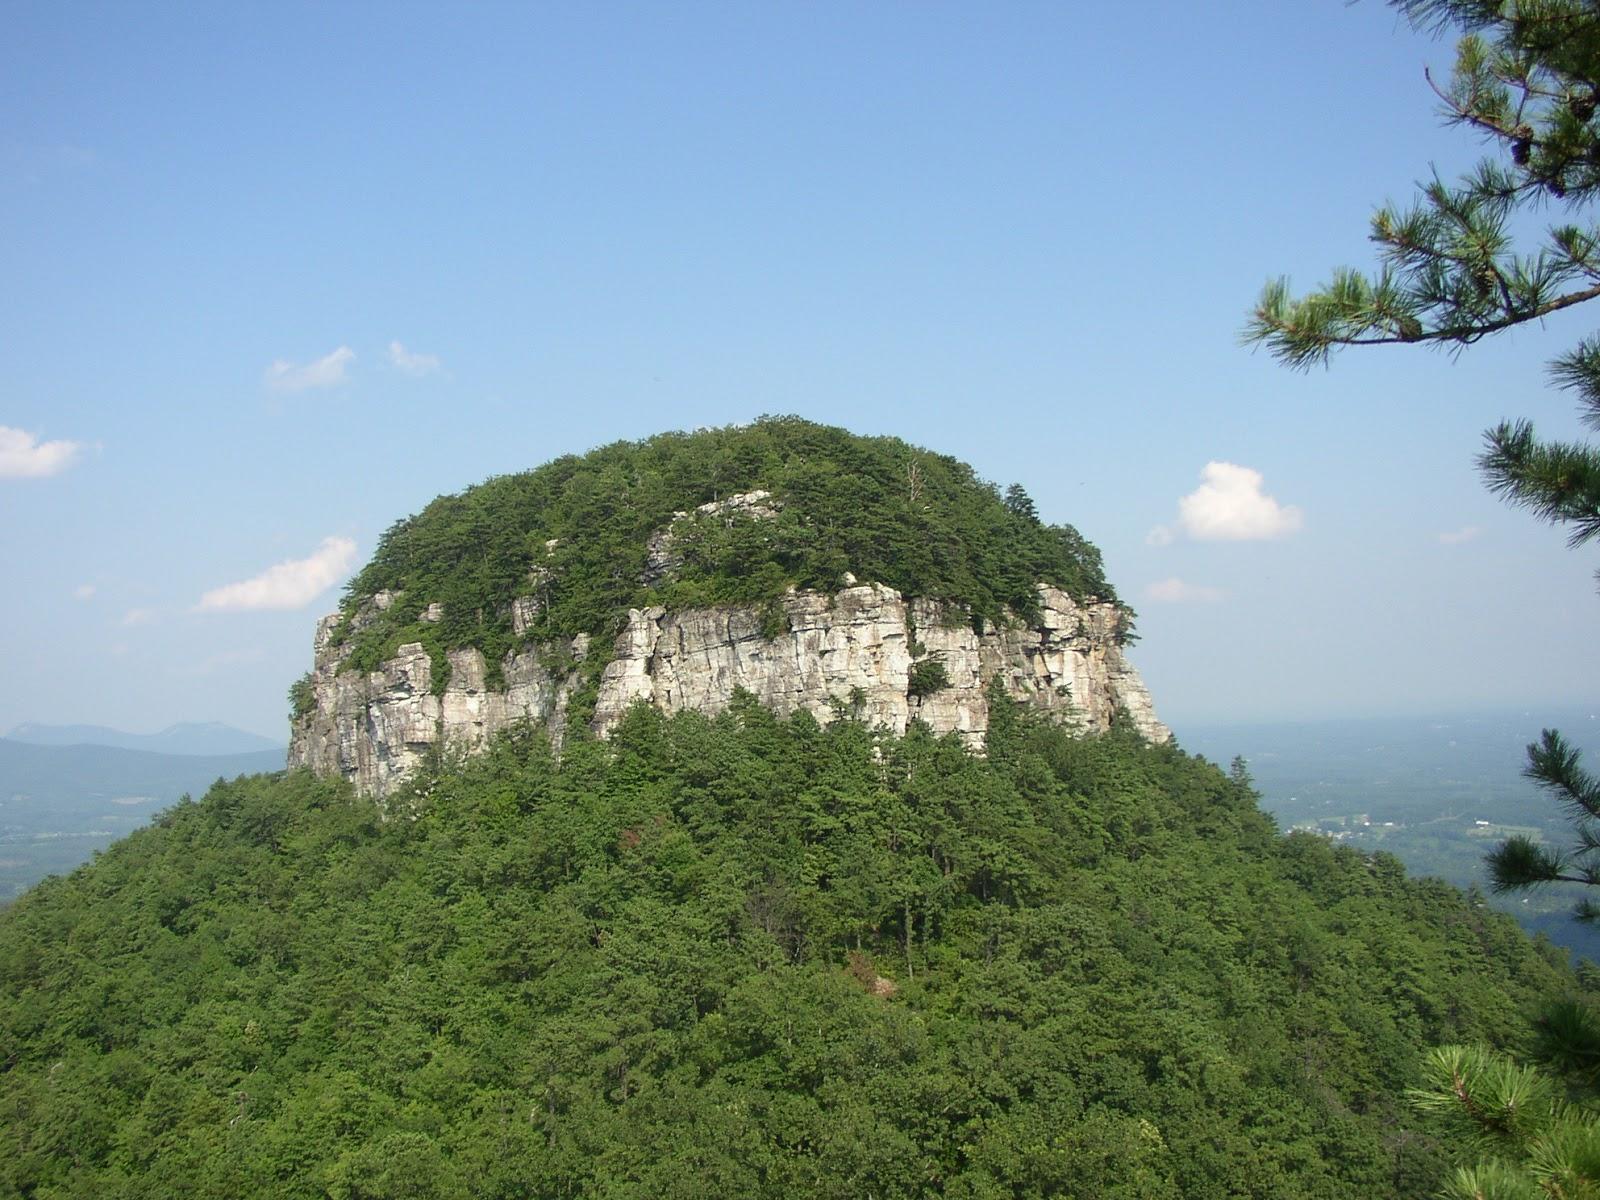 https://1.bp.blogspot.com/-SArzhyyvQws/TkYjJ5RIvlI/AAAAAAAAEnc/BR2k0NFIlU8/s1600/burkina-faso-mountain.jpg